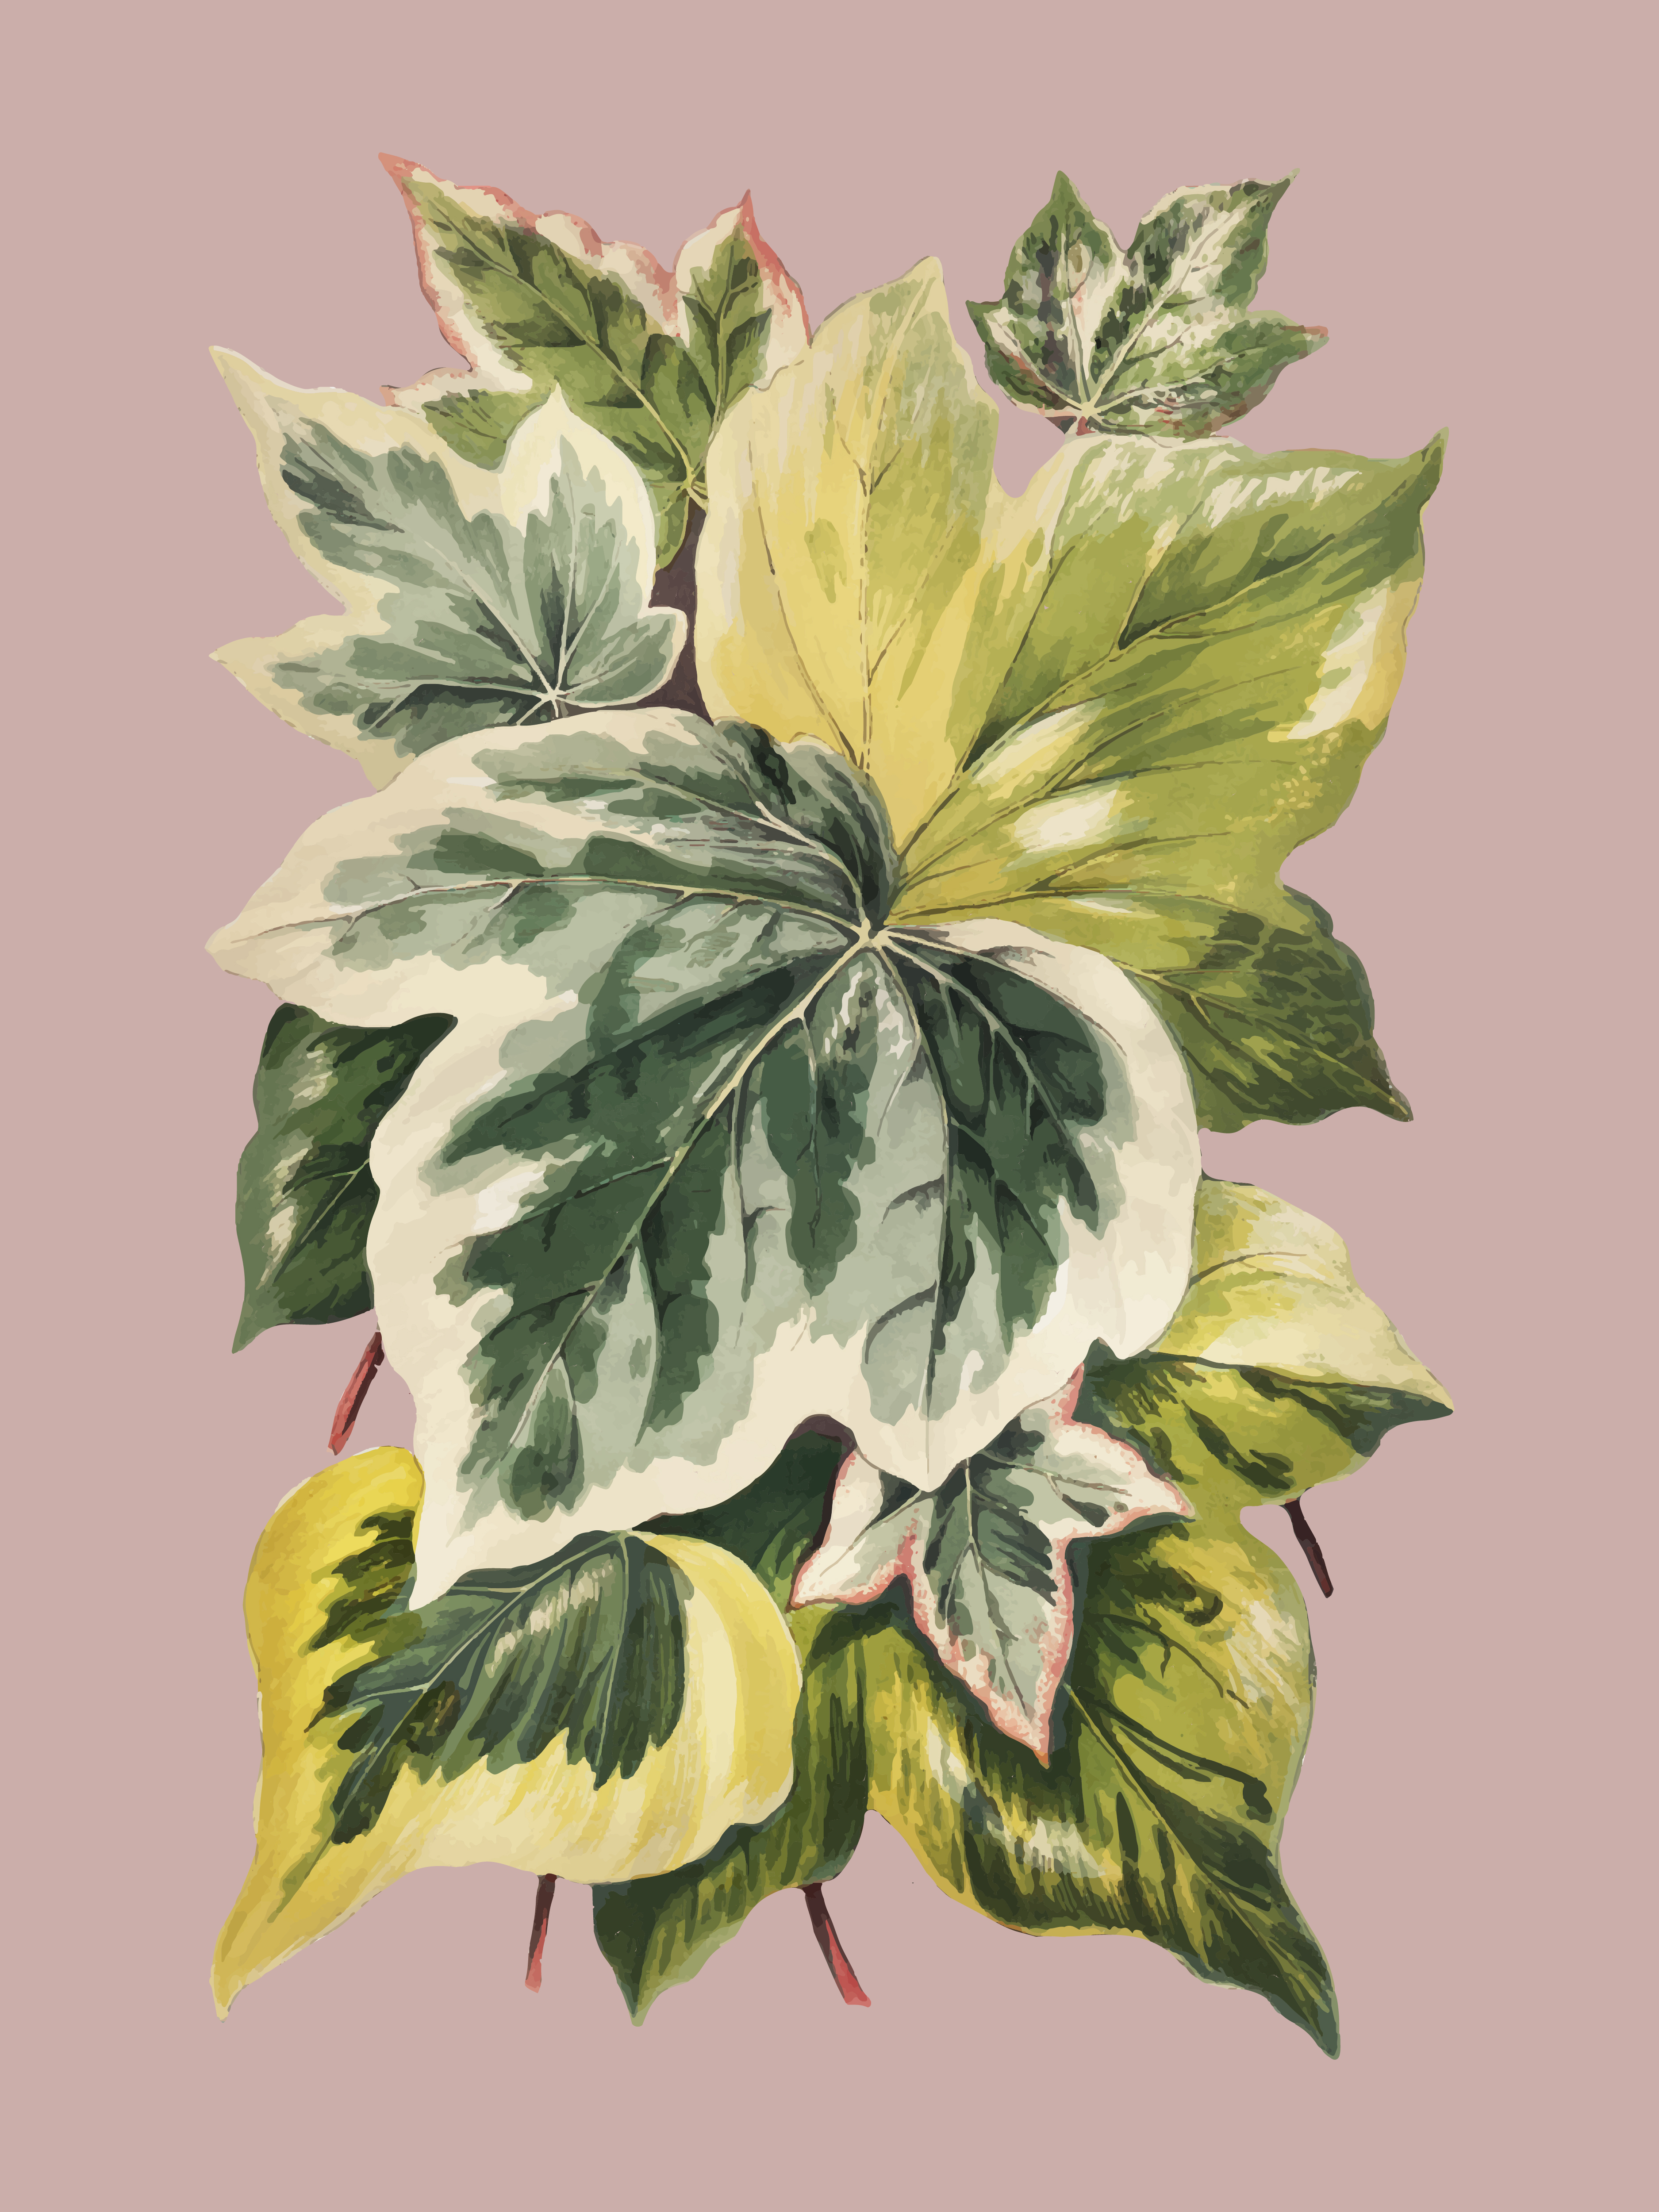 Vintage Plants And Leaves Illustration Download Free